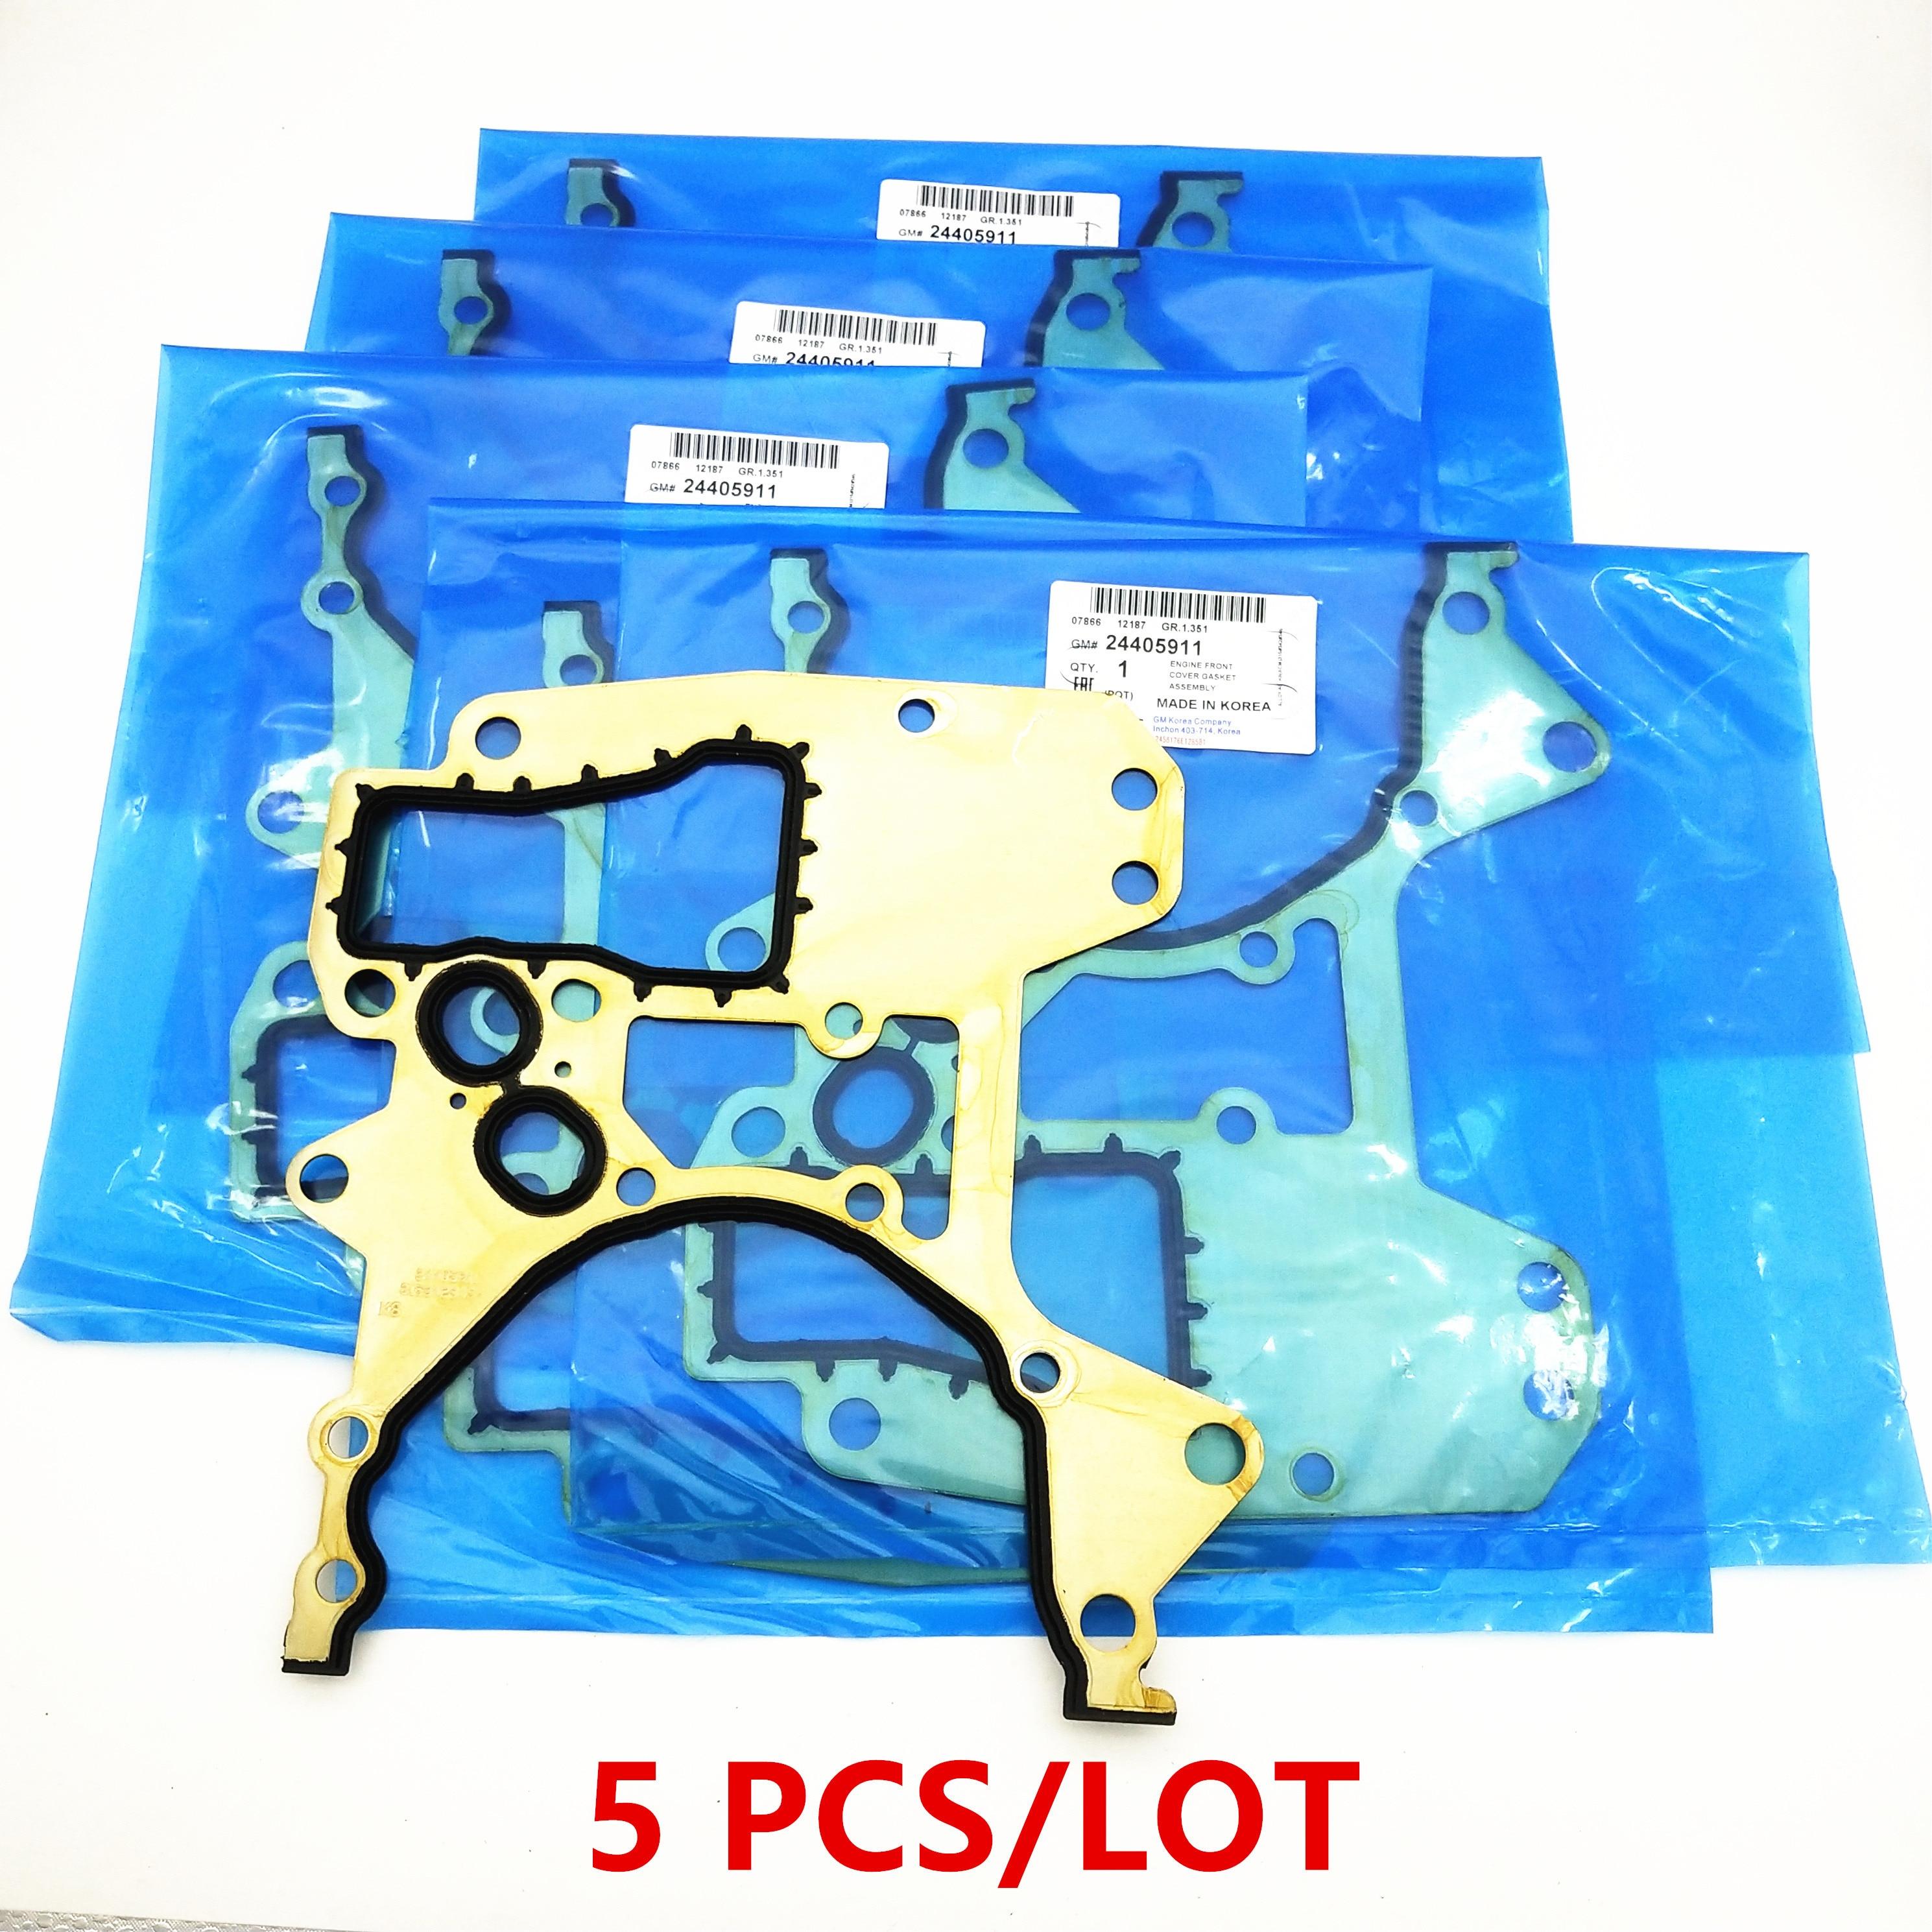 5PCS Original Engine Timing Cover Gasket For Chevolet Cruze Sonic Aveo Pontiac G3 Opel Astra 1.6L/1.8L engine OEM# 24405911